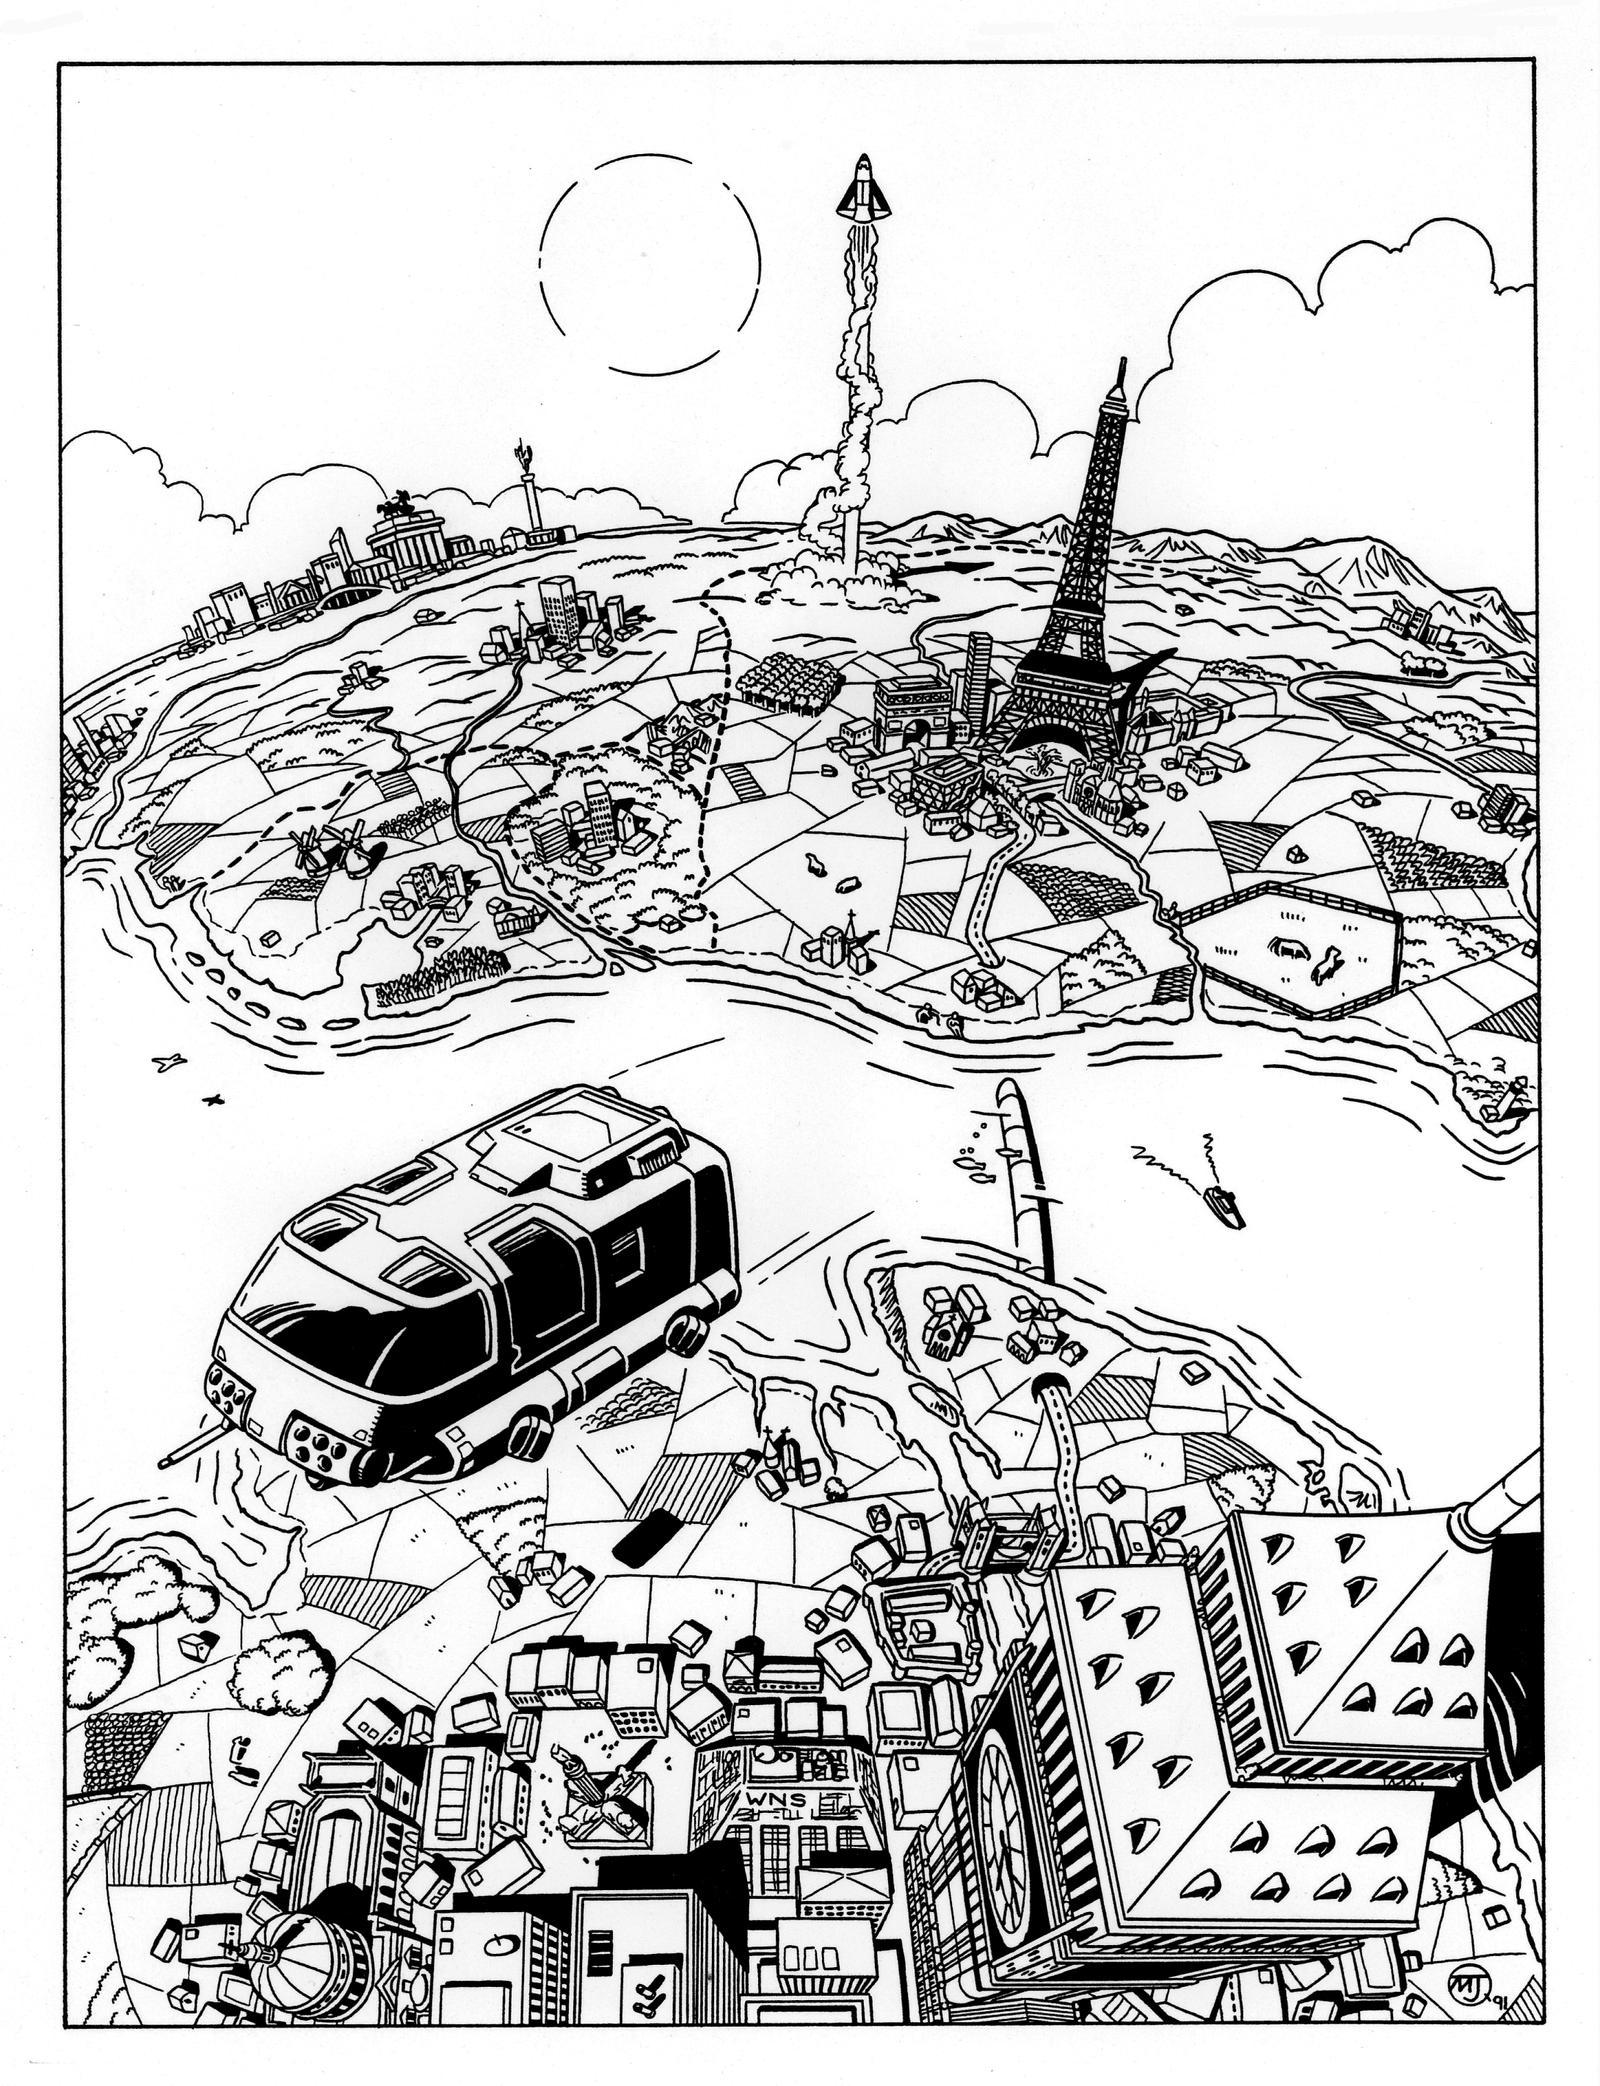 Cyberpunk - Europe by SteamPoweredMikeJ